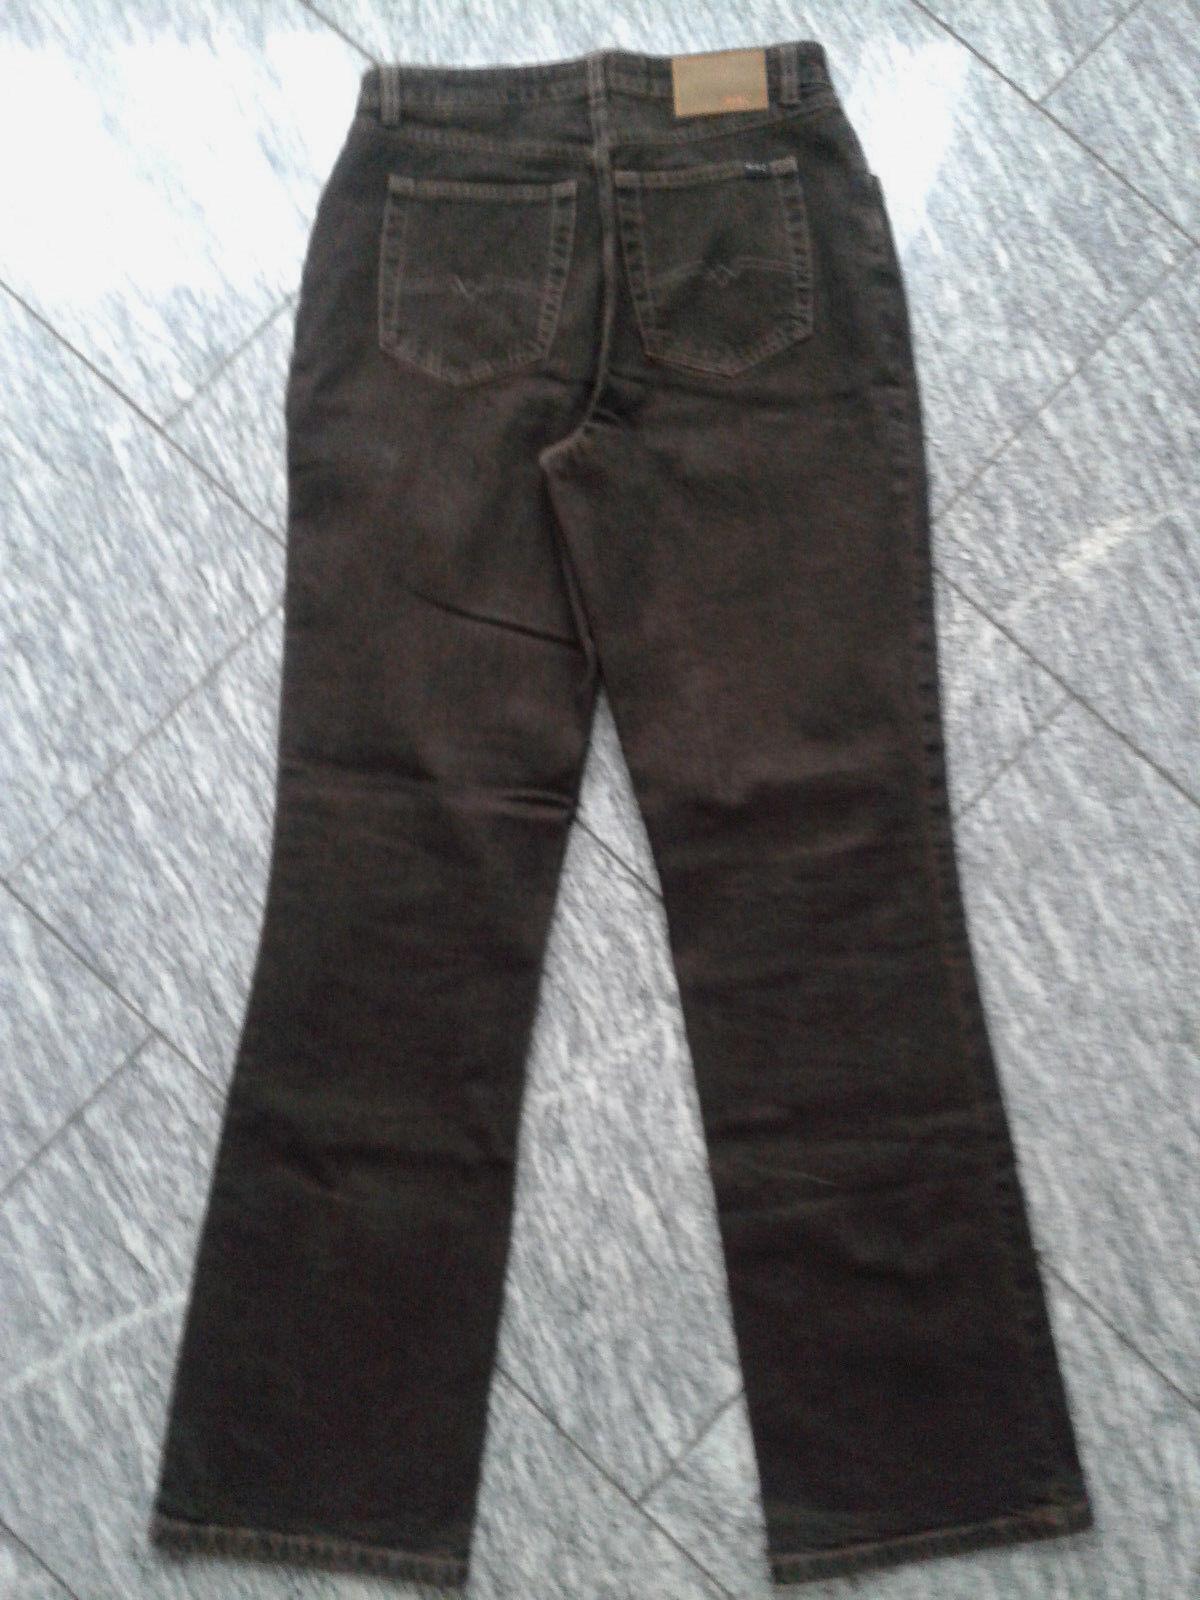 MAC Jeans dunkelbraun Gr. 36 neuw. TOP | | | Verschiedene Stile  | Neuankömmling  | Großer Räumungsverkauf  | Günstige Preise  | Moderner Modus  548be4